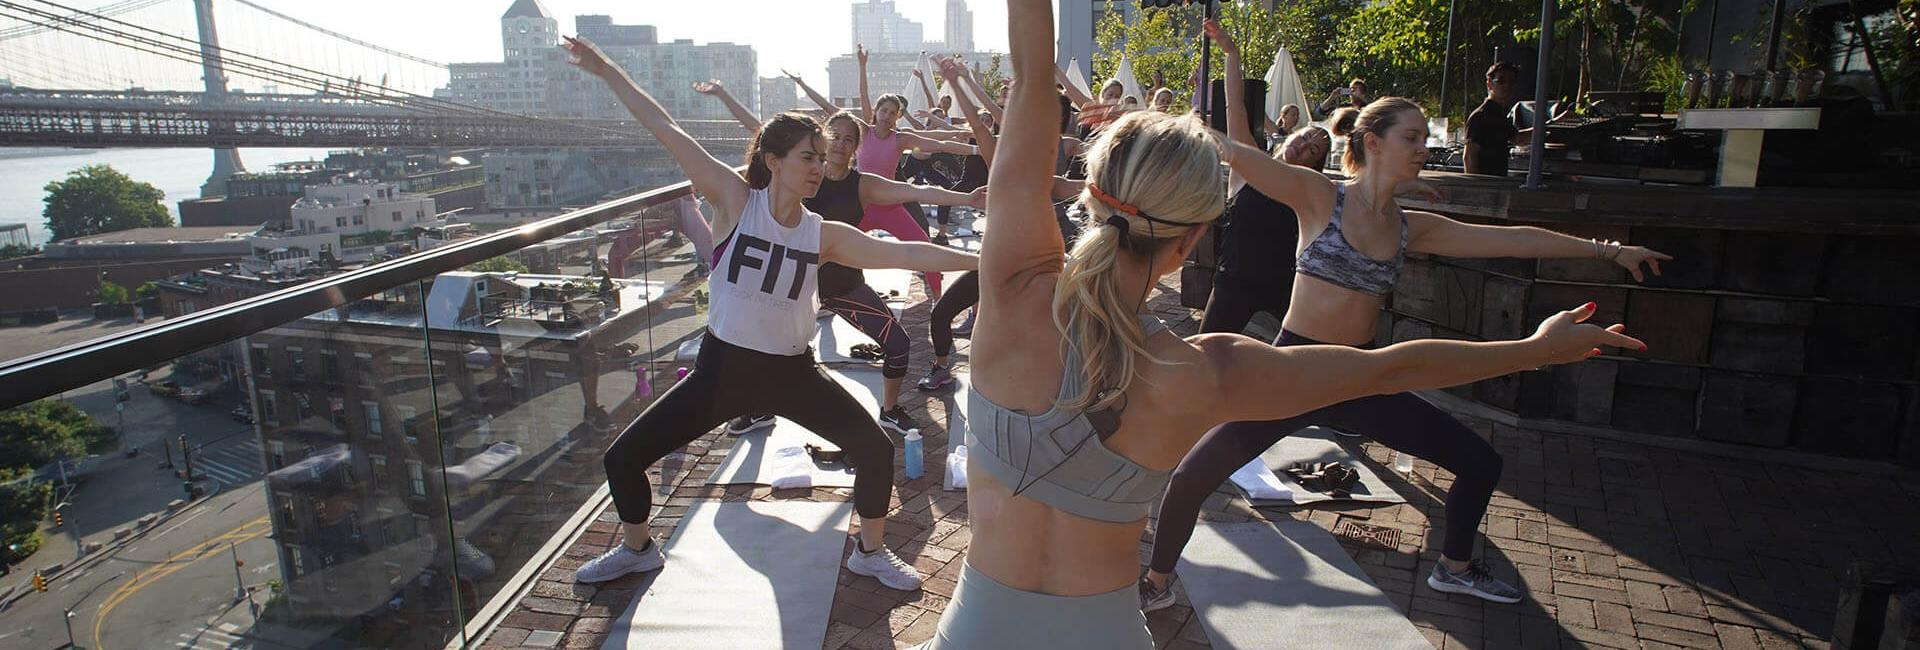 Fitness Event at 1 Hotel Brooklyn Bridge